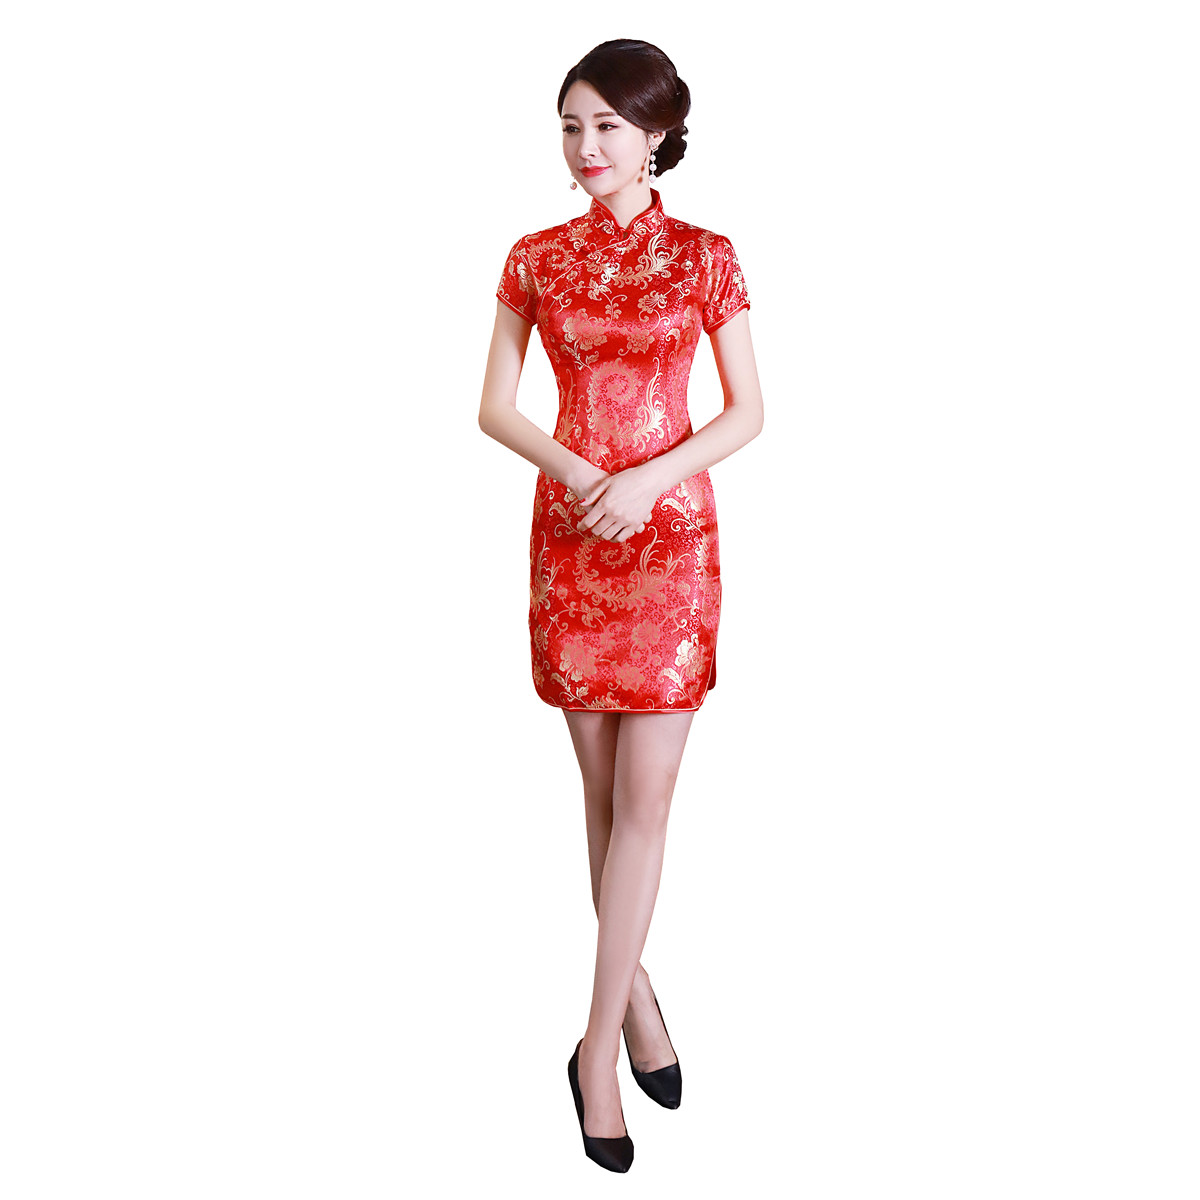 Splendidi fiori rosa Etnico Cinese Ricami Qipao Cheongsam mezza manica slim